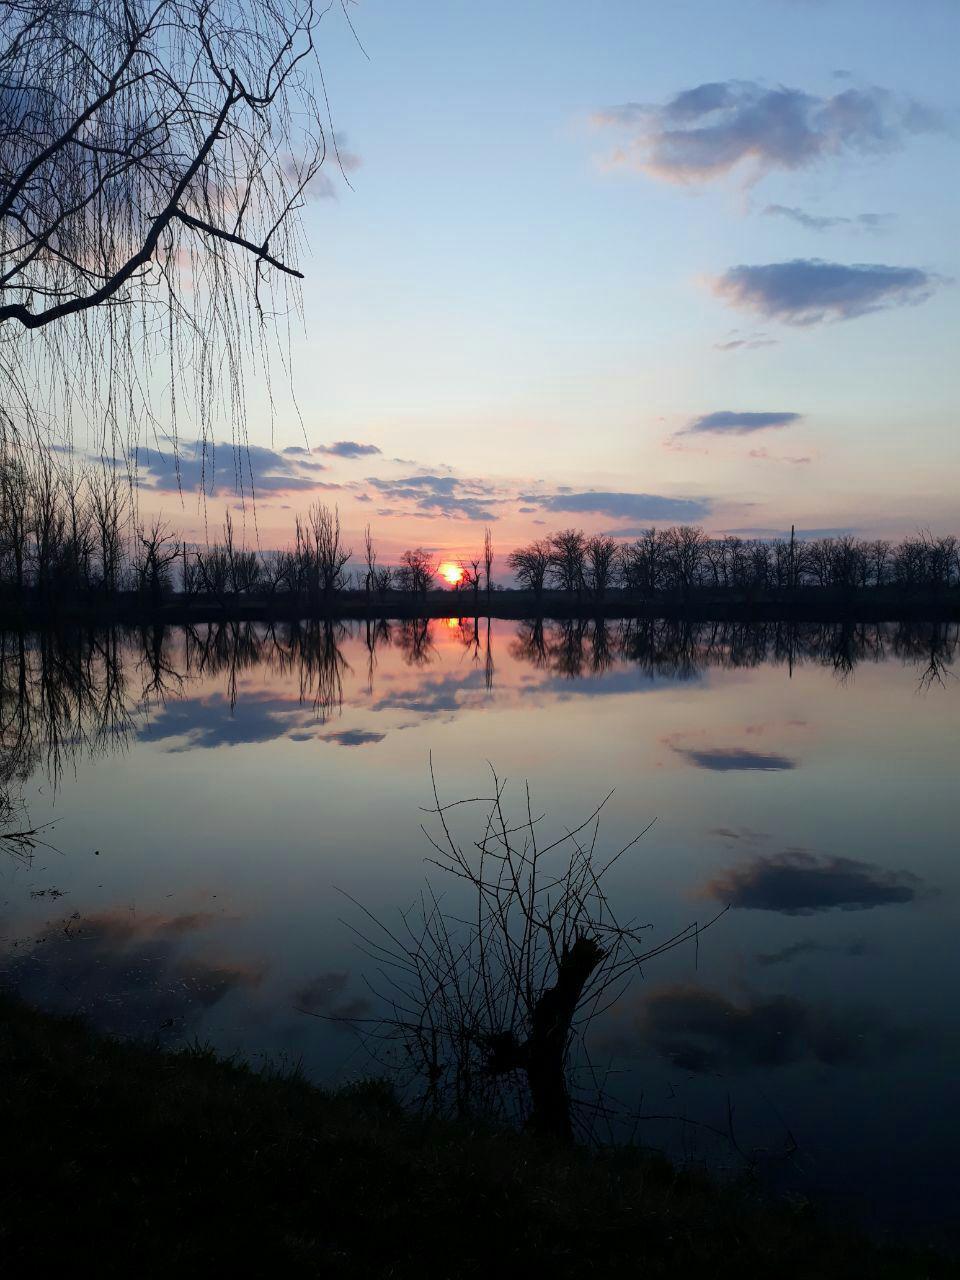 photo_2018-04-14_11-33-51.jpg